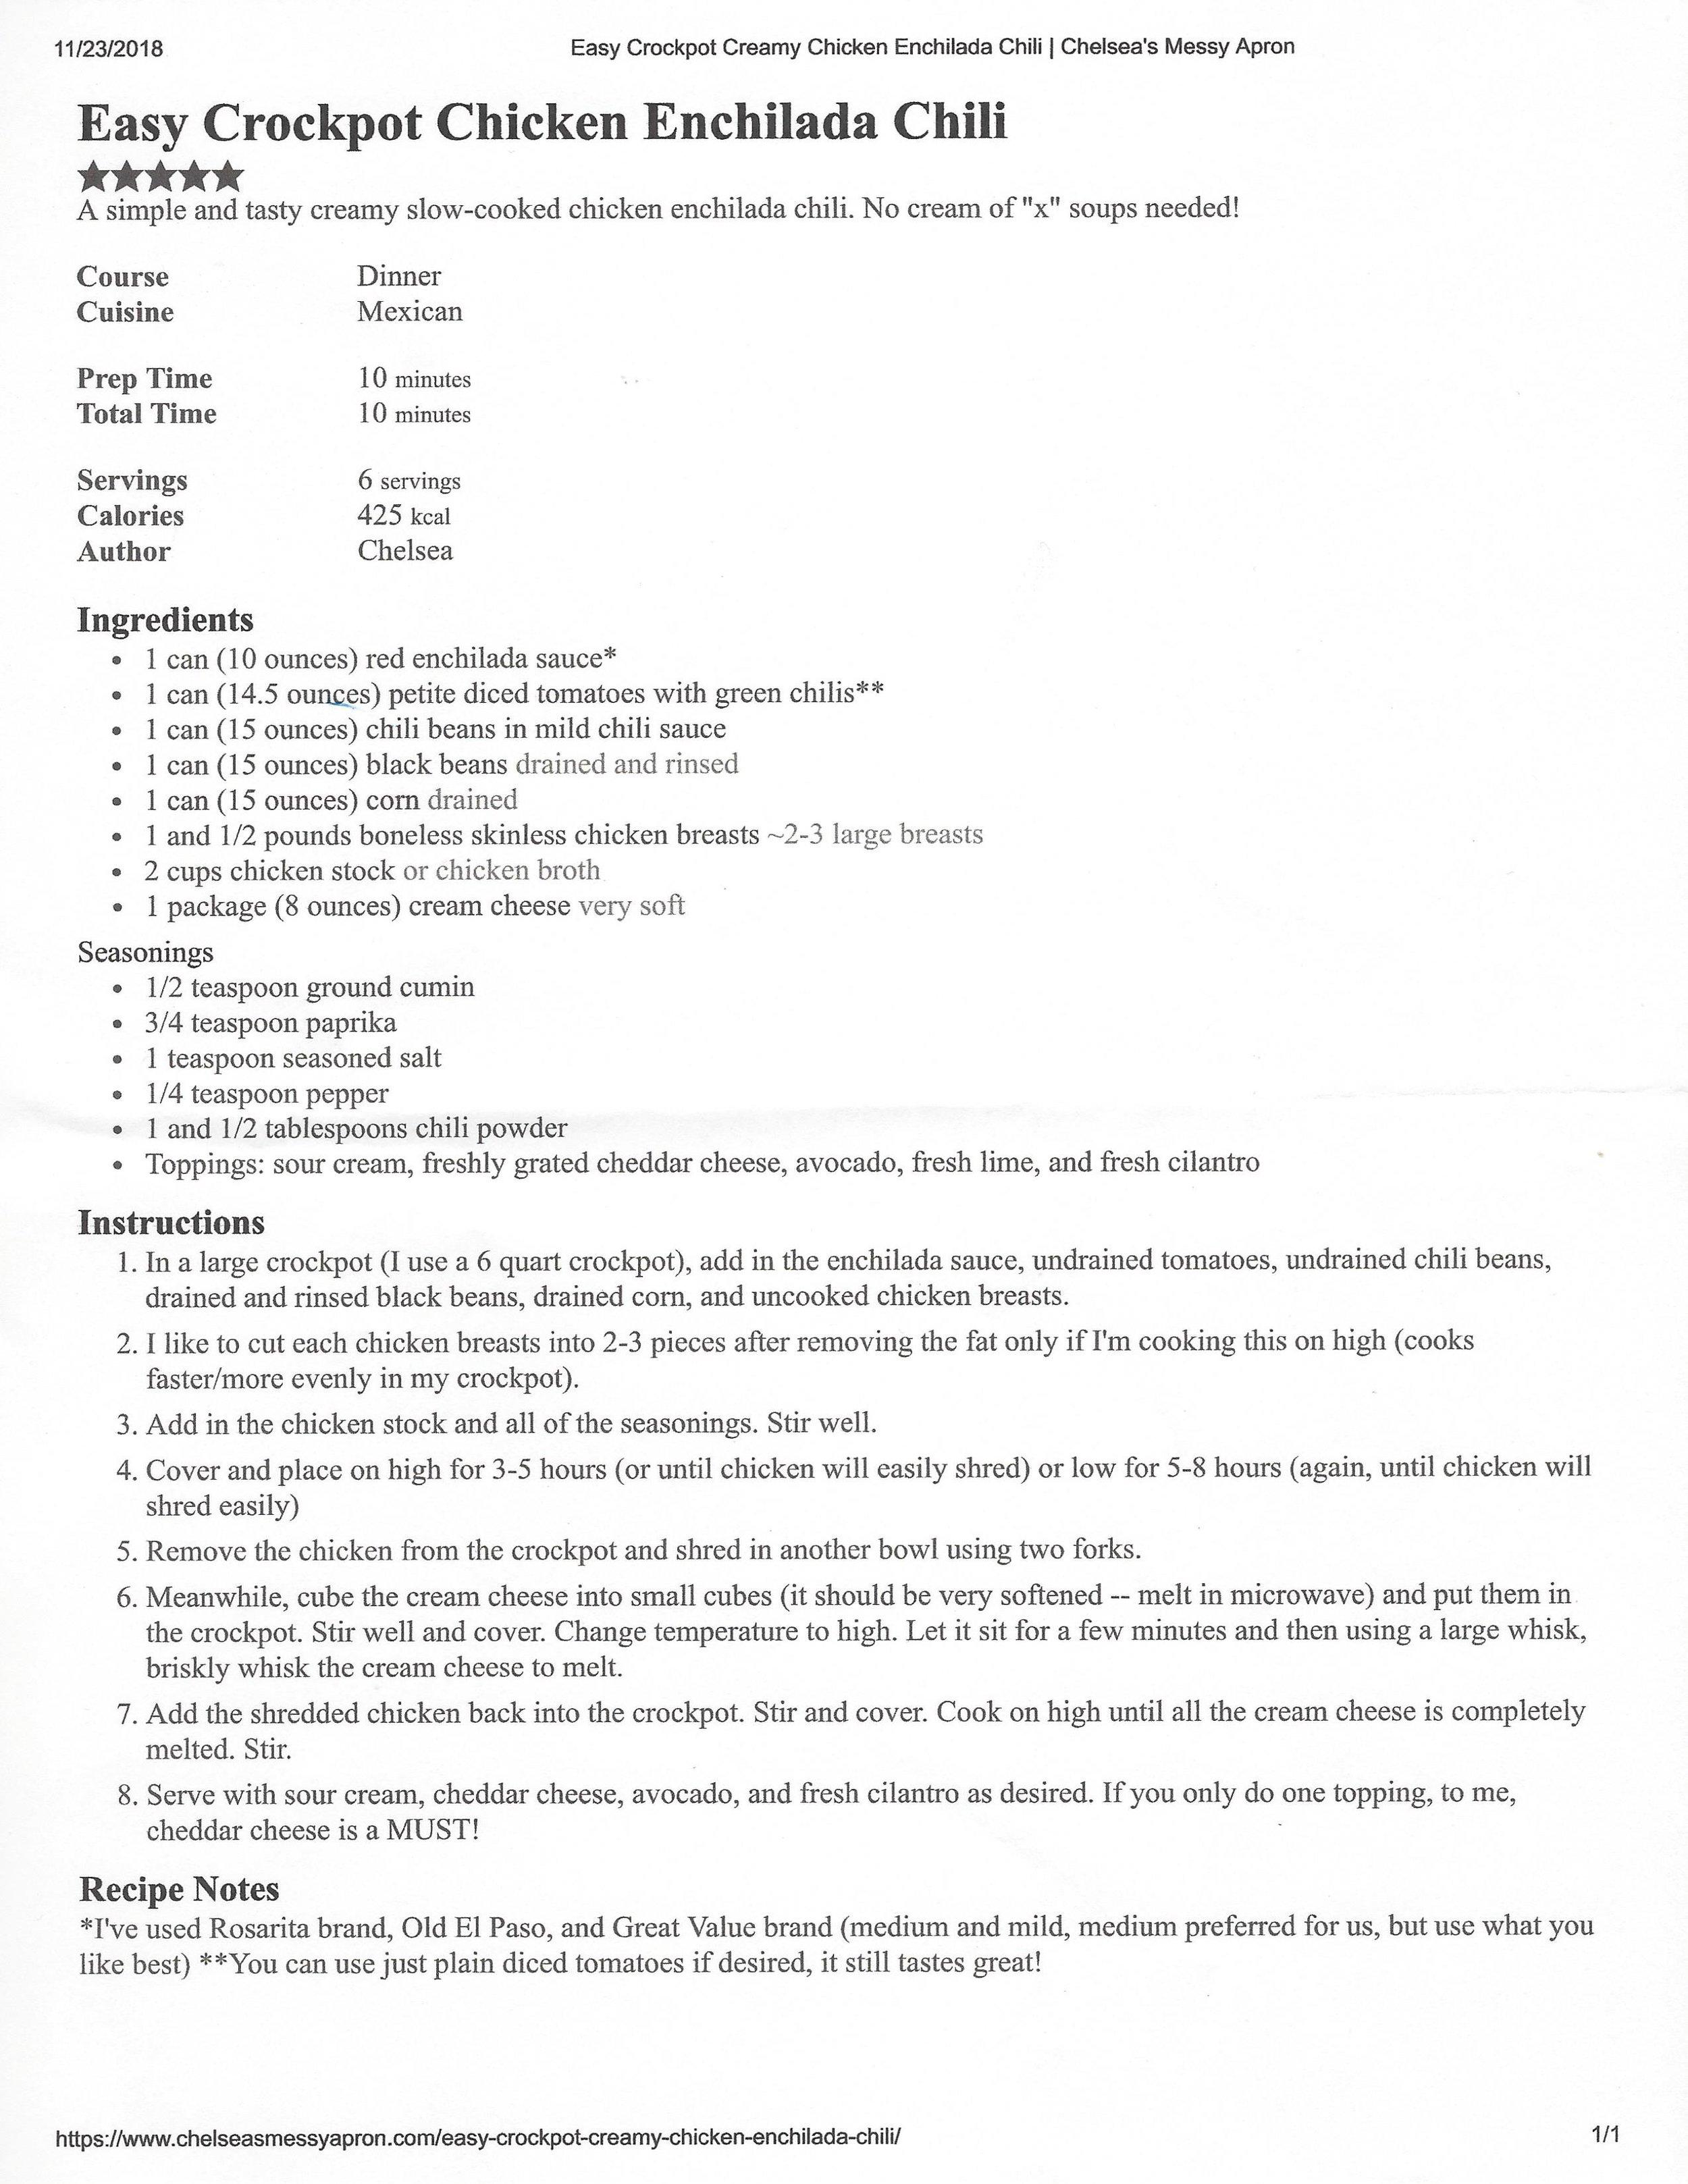 View original recipe here (chelseasmessyapron.com/easy-crockpot-creamy-chicken-enchilada-chili) >